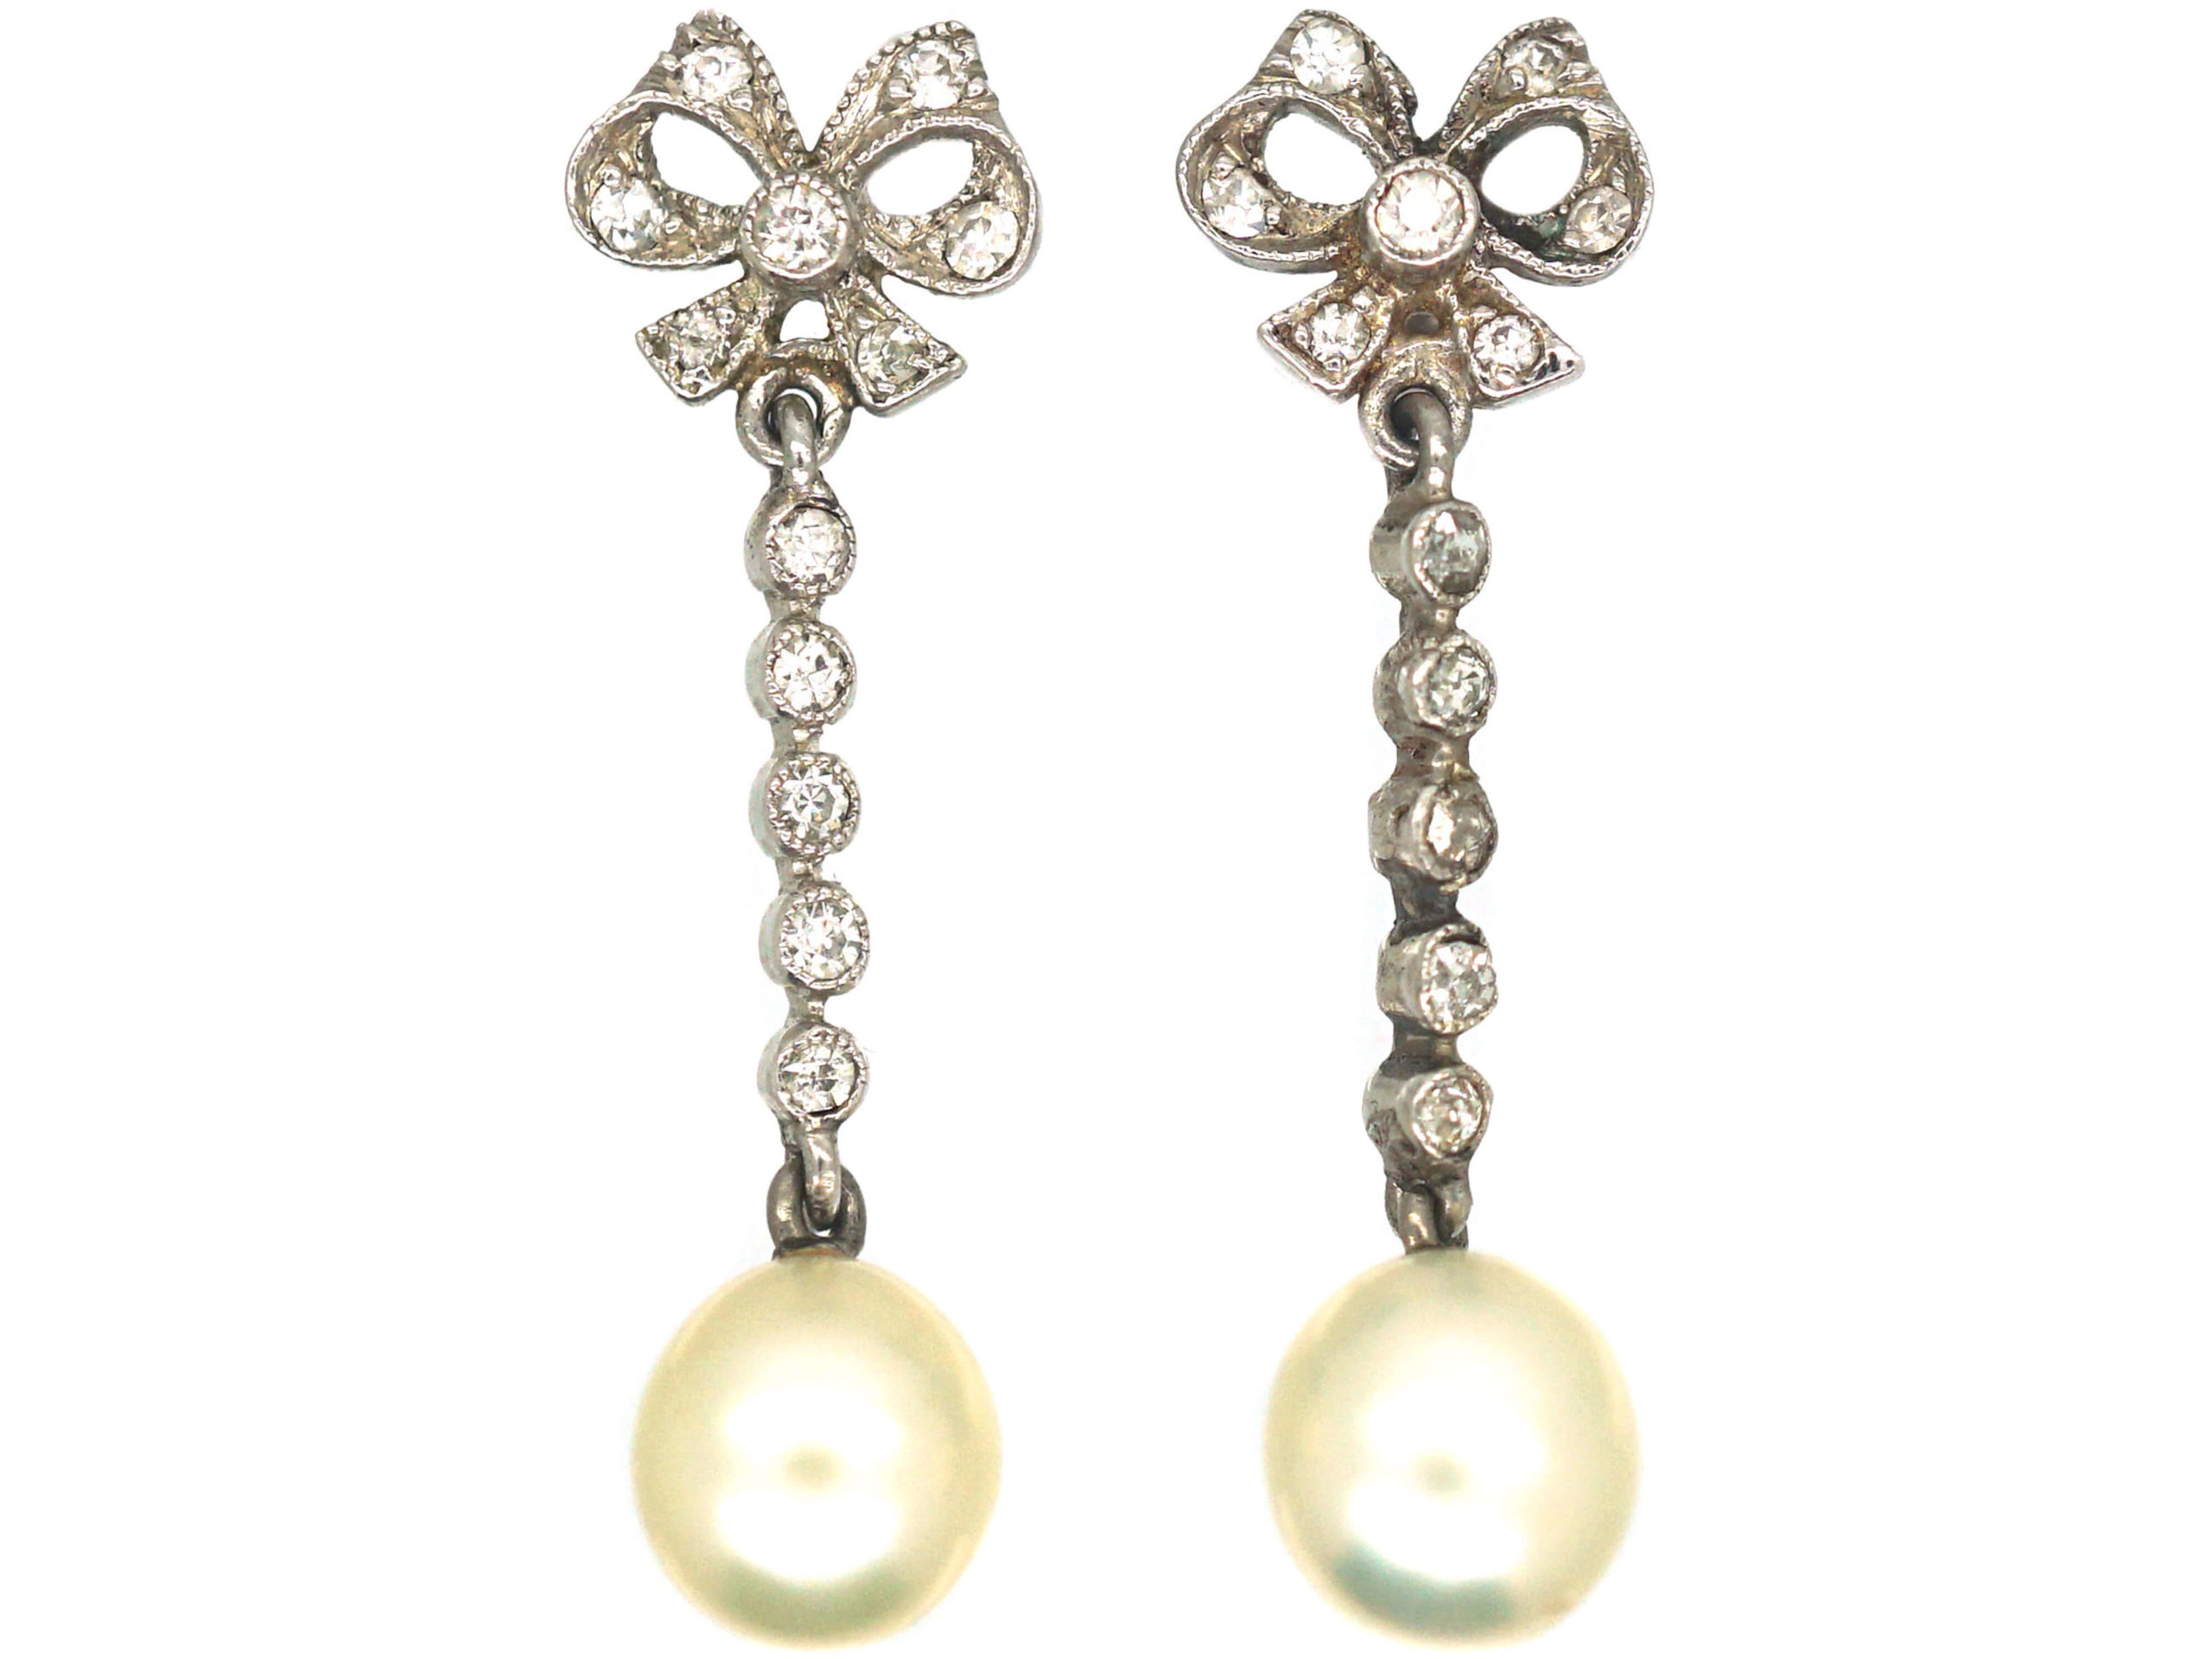 Edwardian Platinum, Diamond & Pearl Bow Drop Earrings